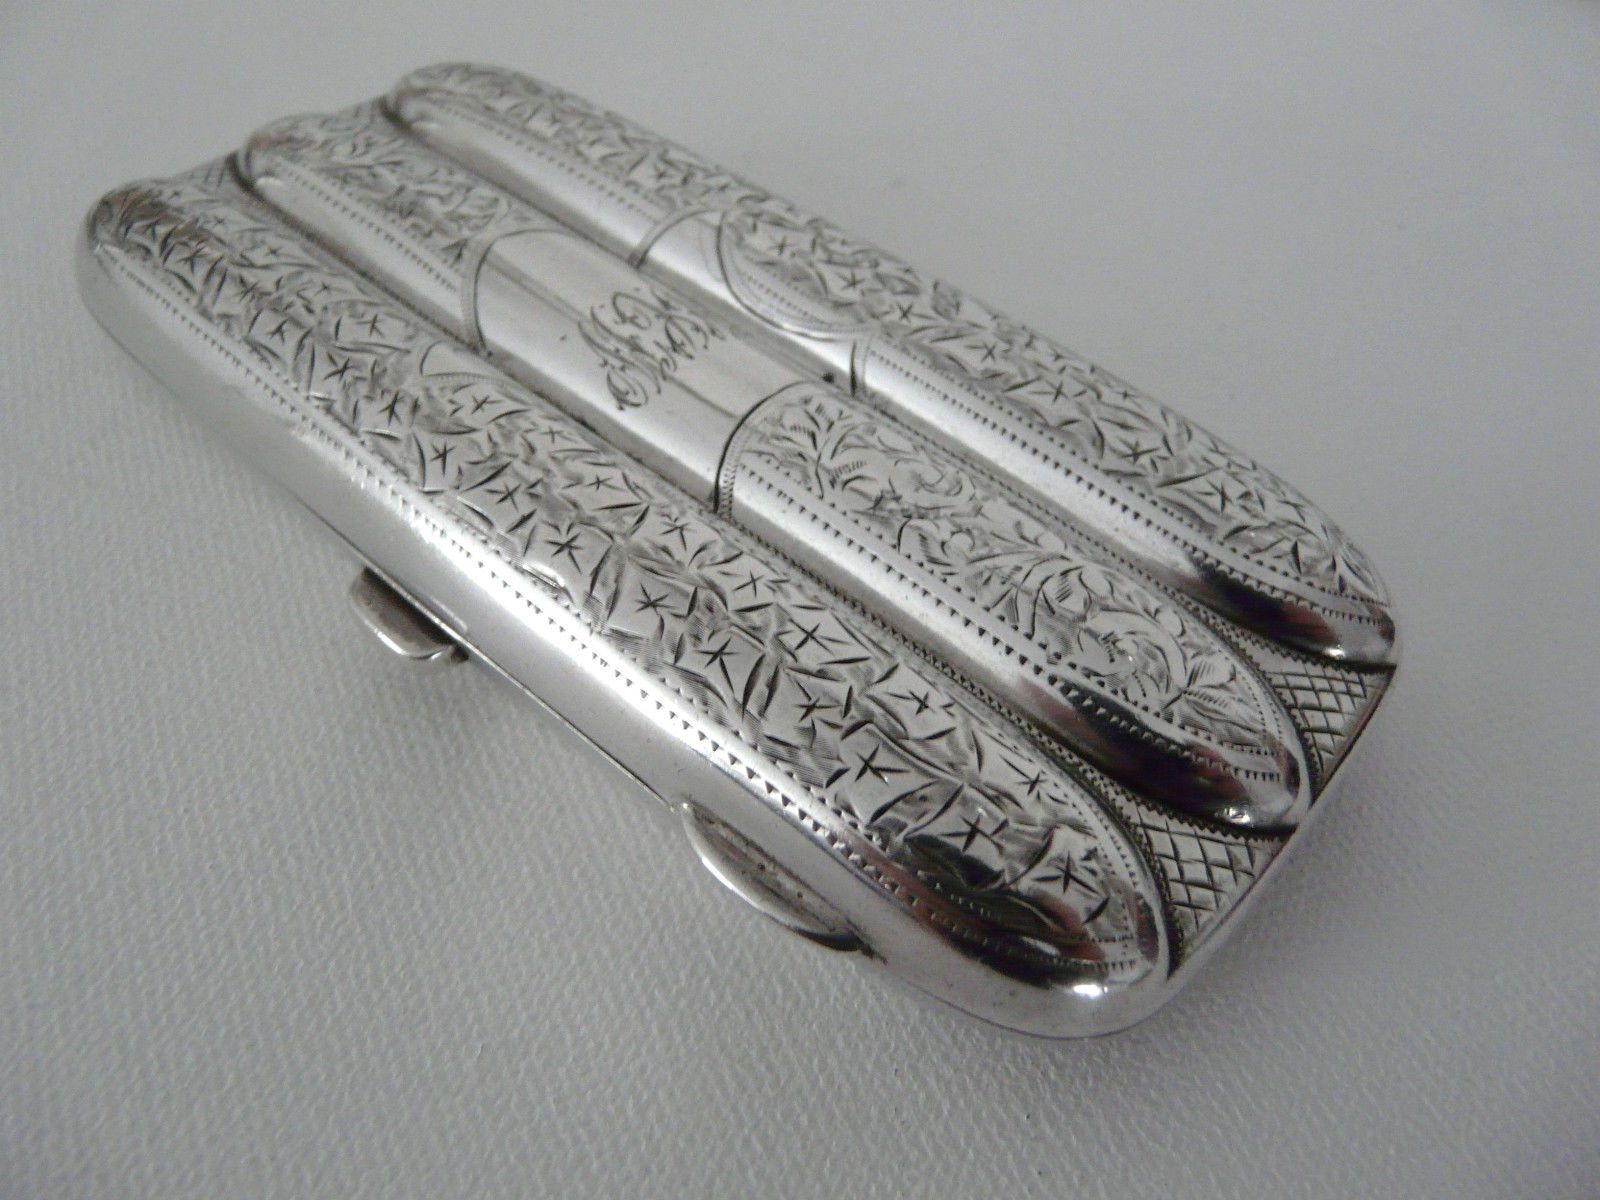 Antique Sterling Silver Cigar Case